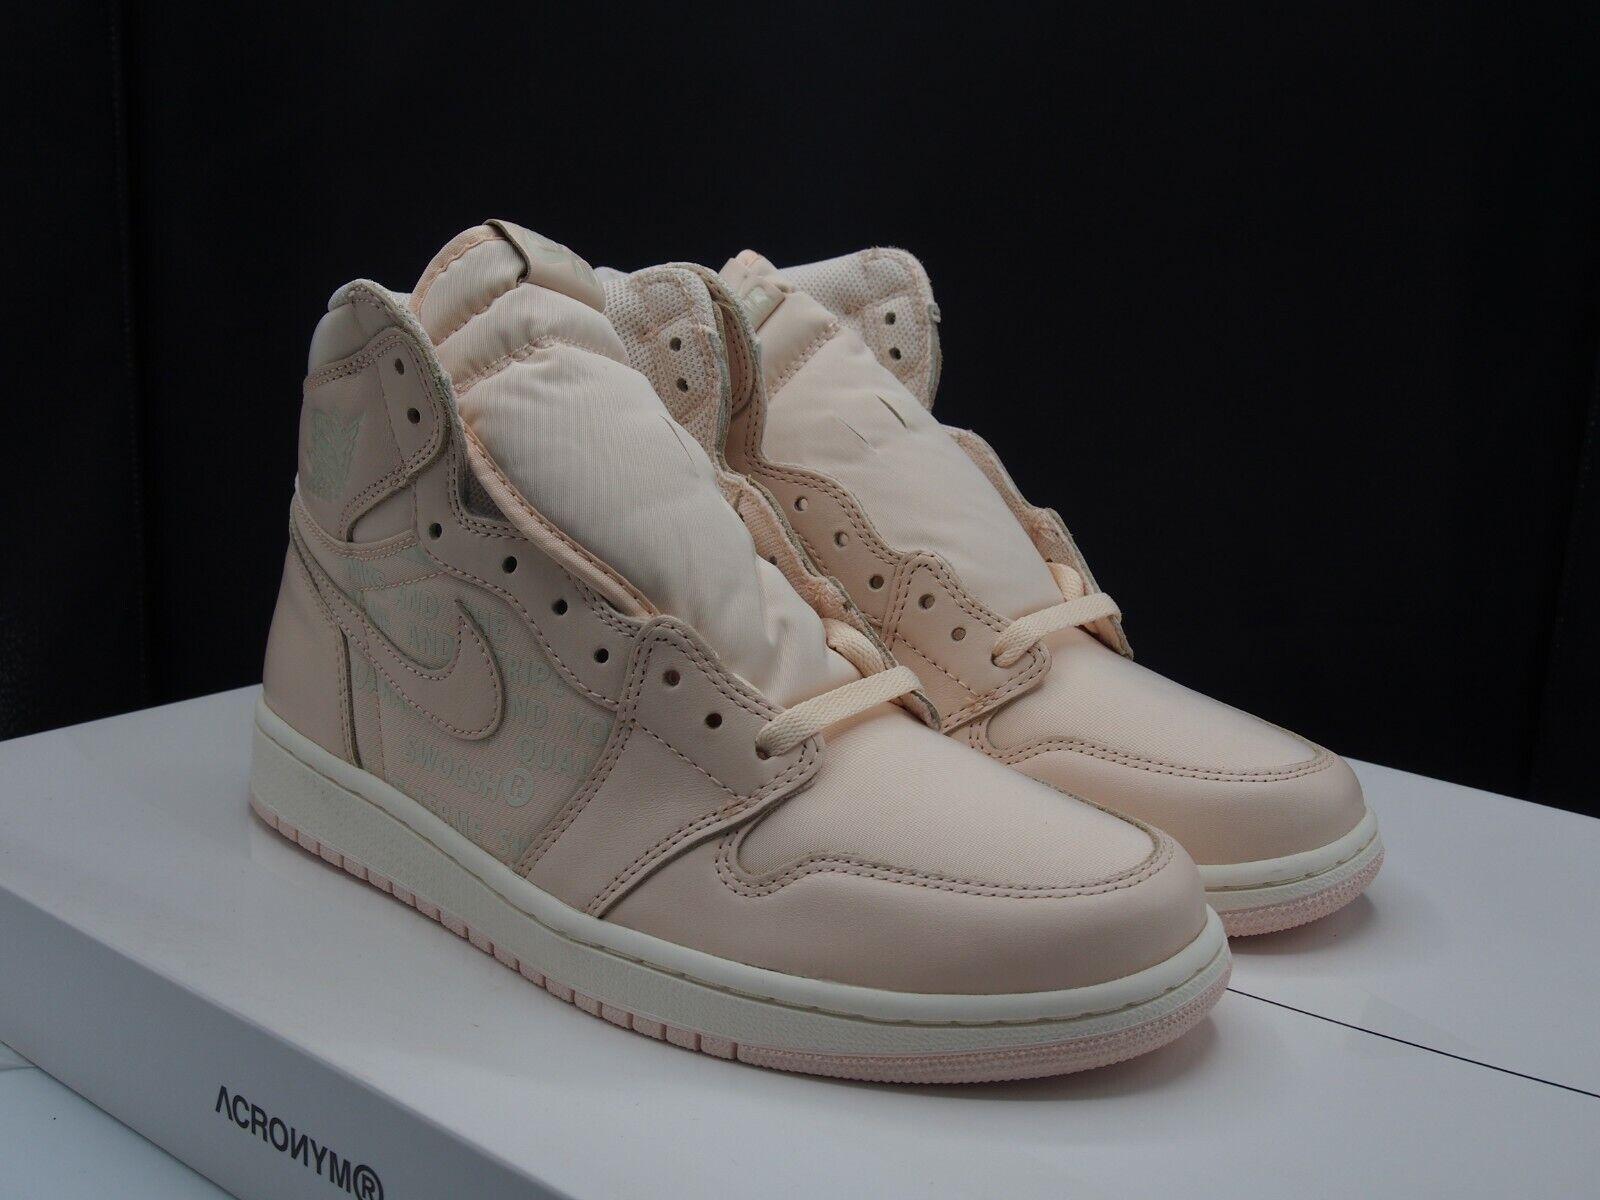 Nike Air Jordan 1 Retro Retro Retro High OG  Guava  555088-801 Men's size 9.5 US 85226c